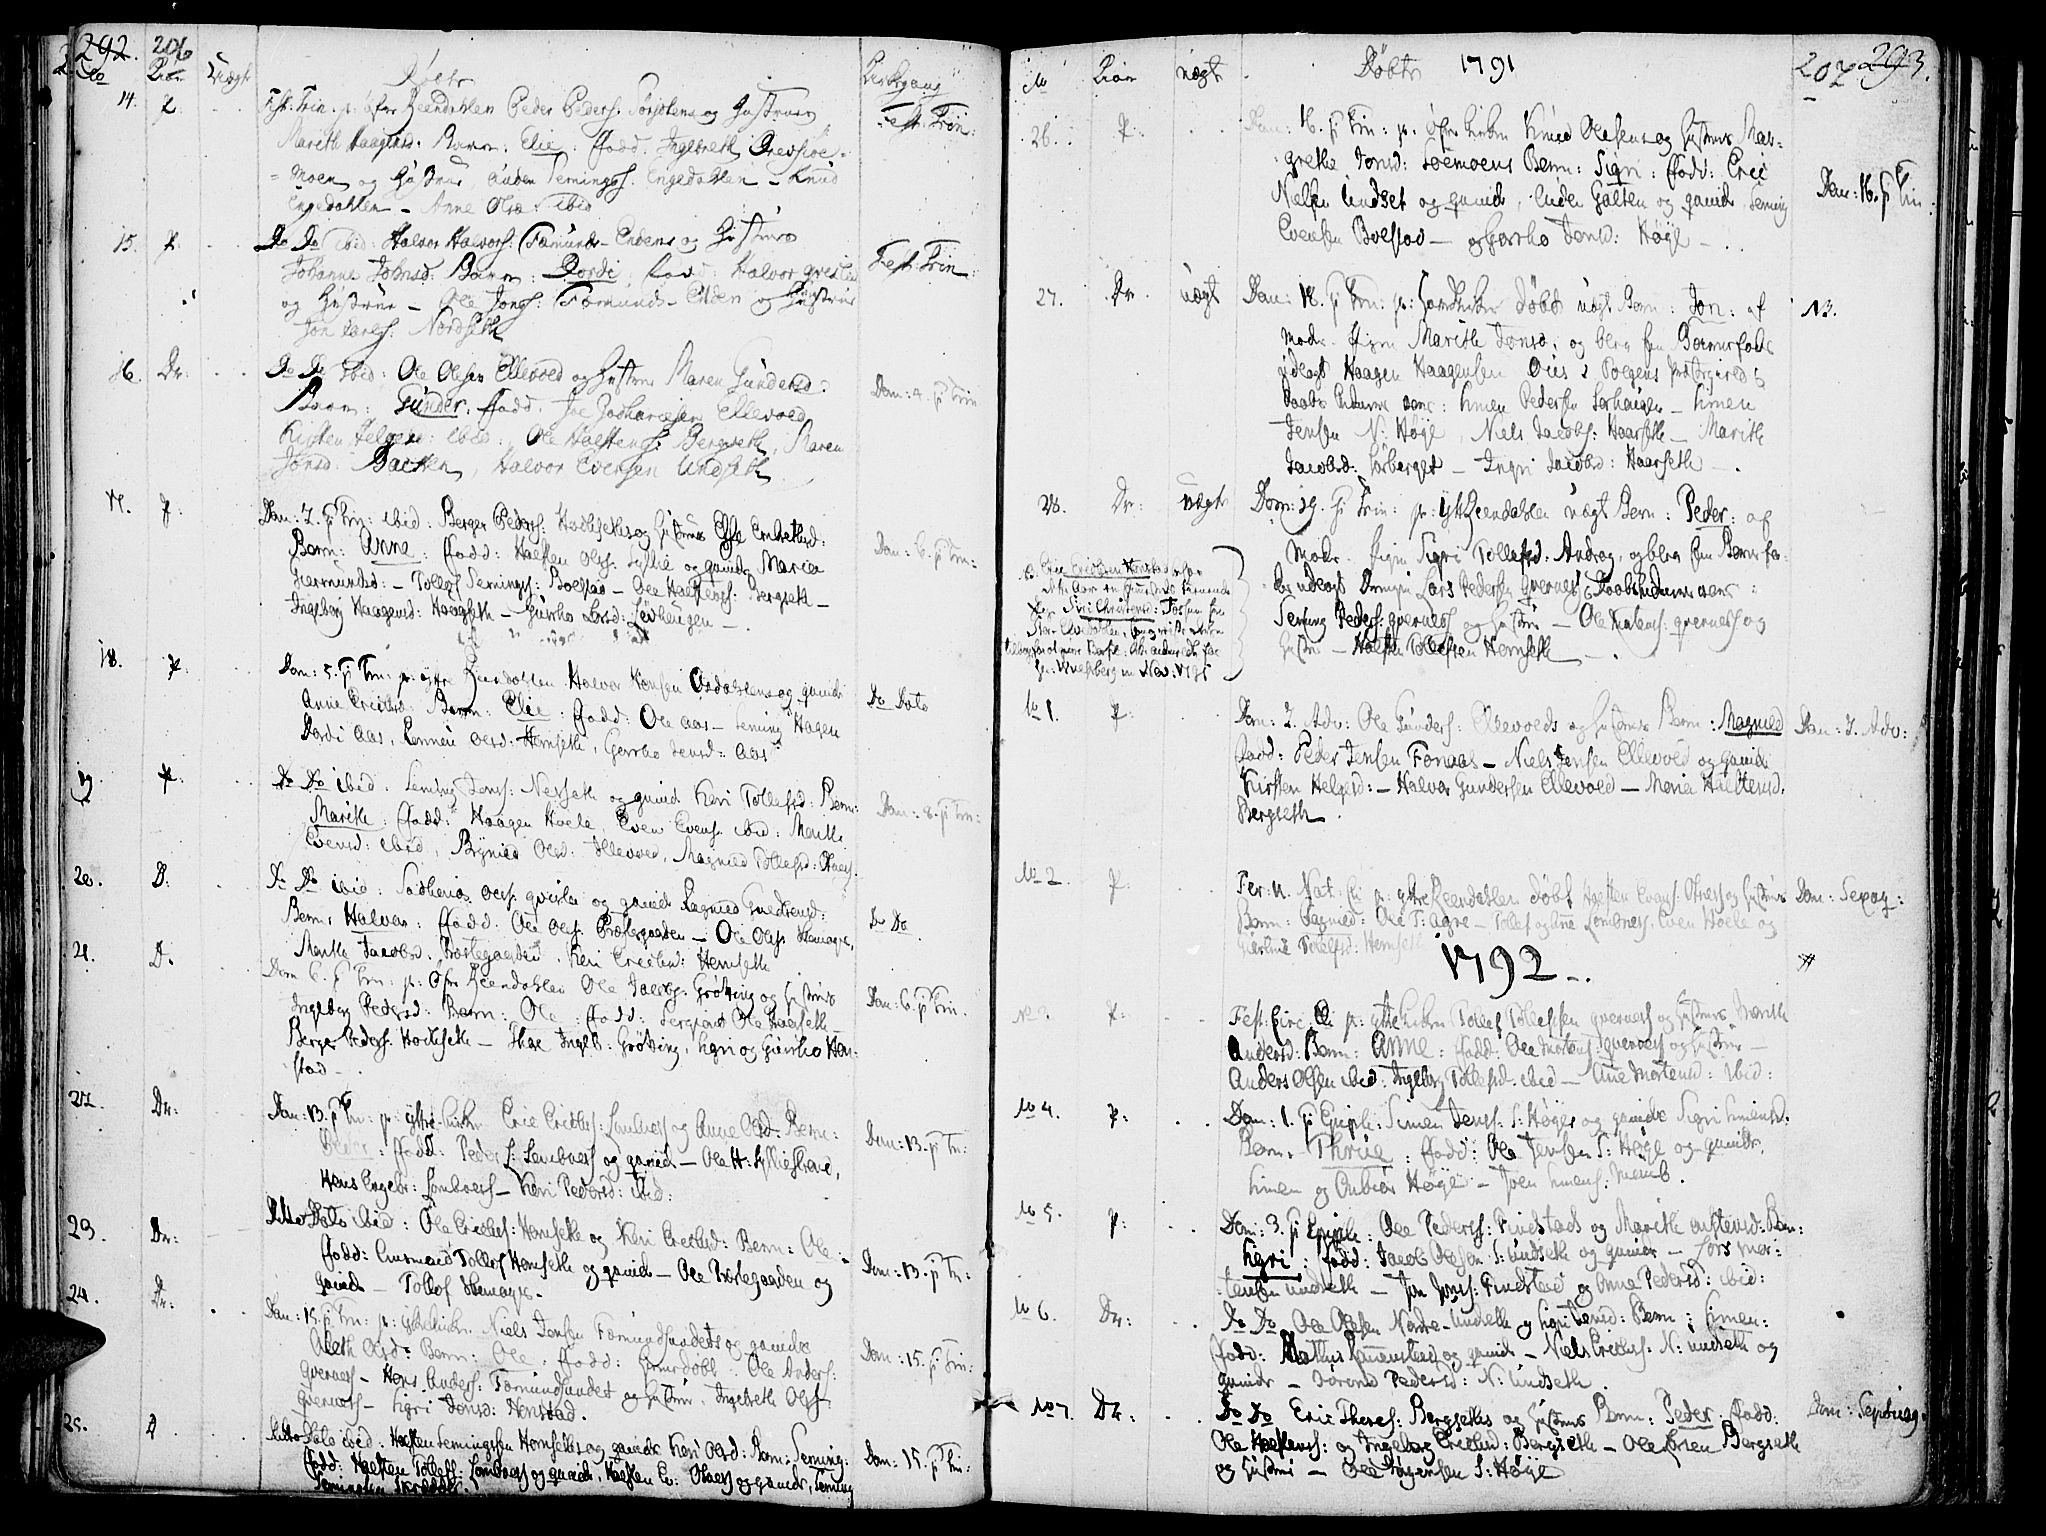 SAH, Rendalen prestekontor, H/Ha/Haa/L0002: Ministerialbok nr. 2, 1788-1814, s. 206-207